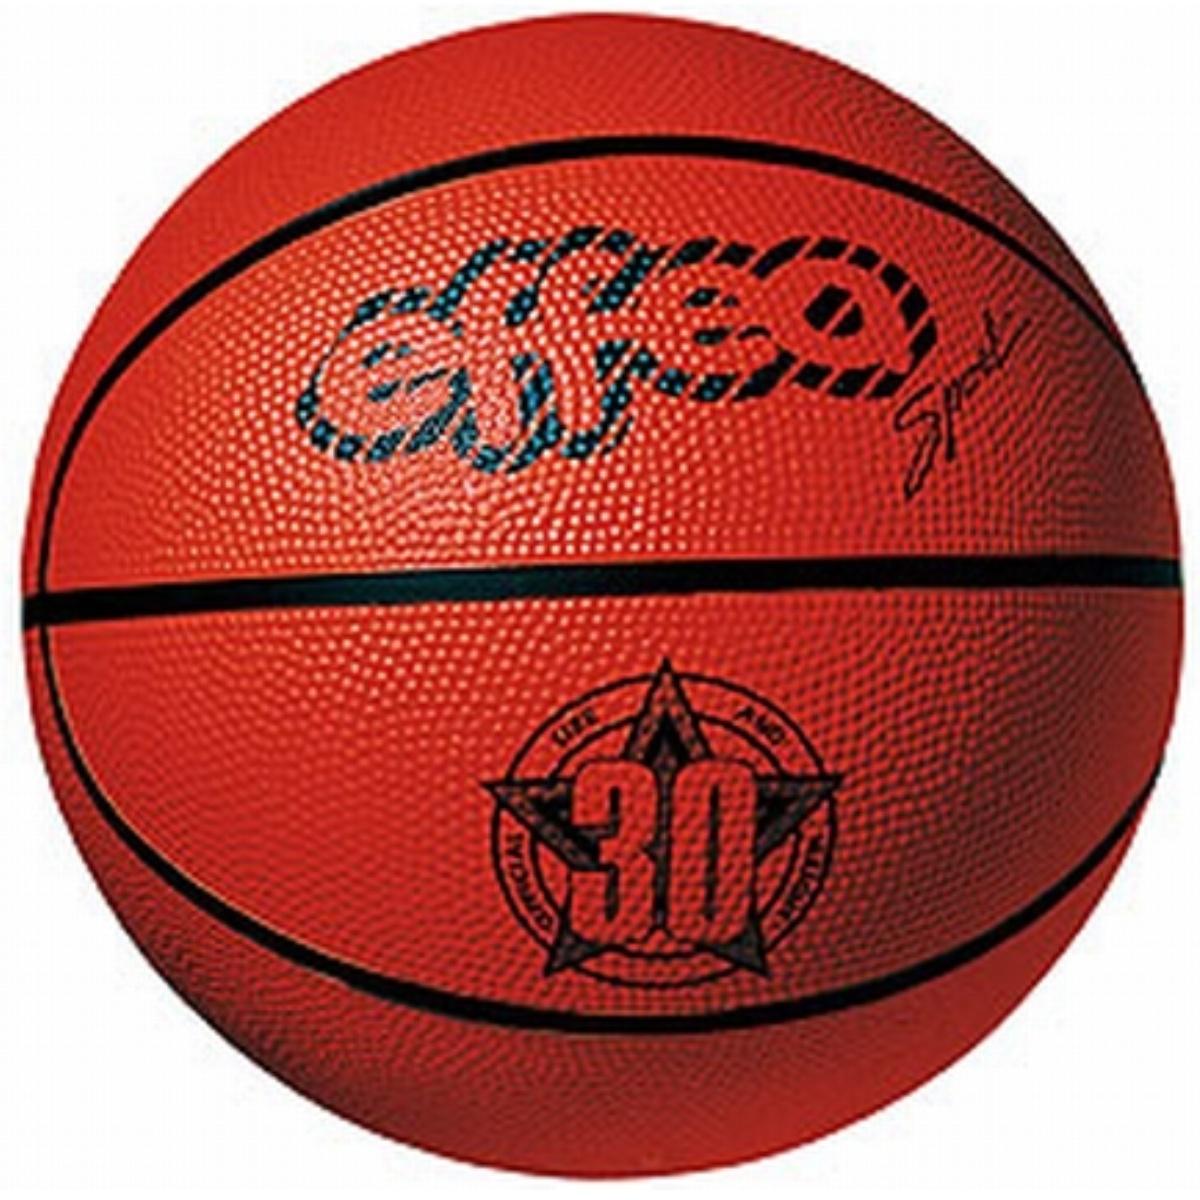 Basketbalový míč EFFEA Star 30